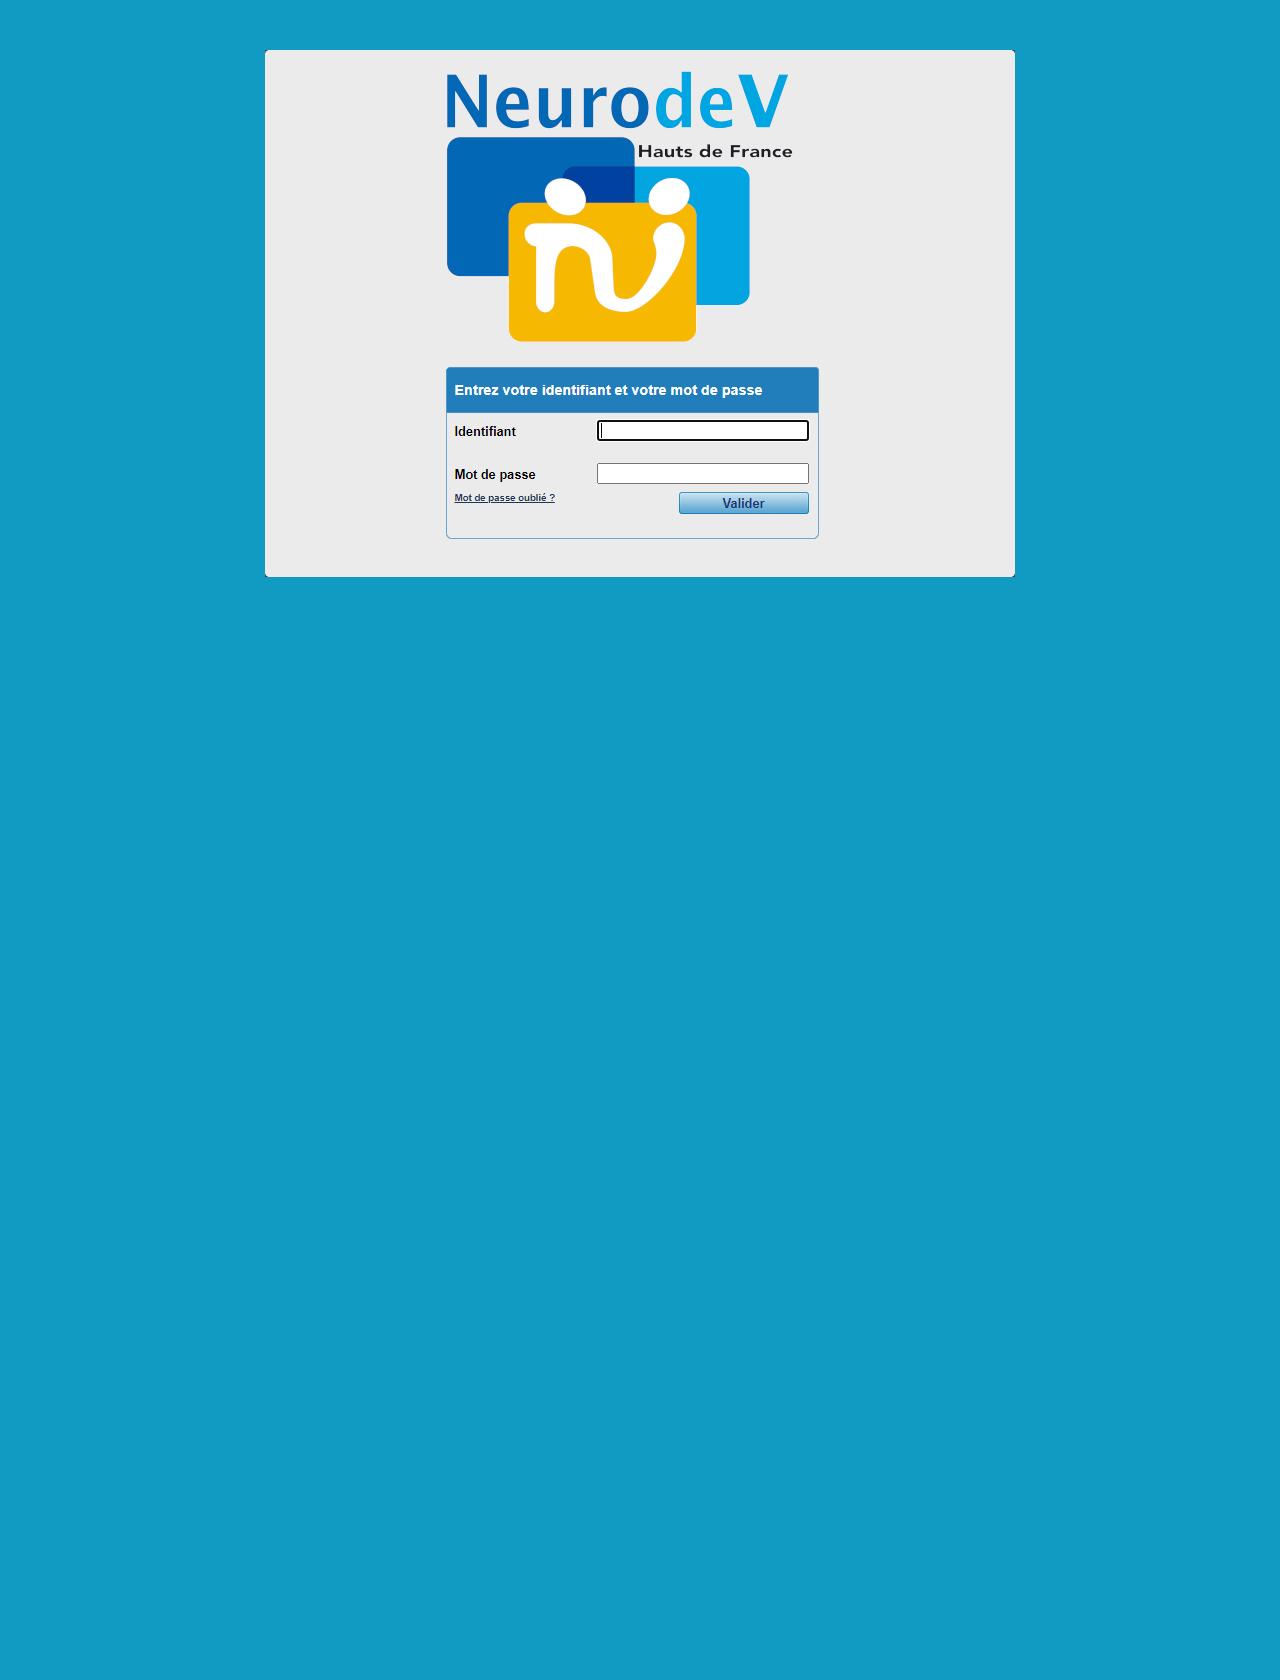 Screenshot Desktop - https://easyclic.neurodev.fr/